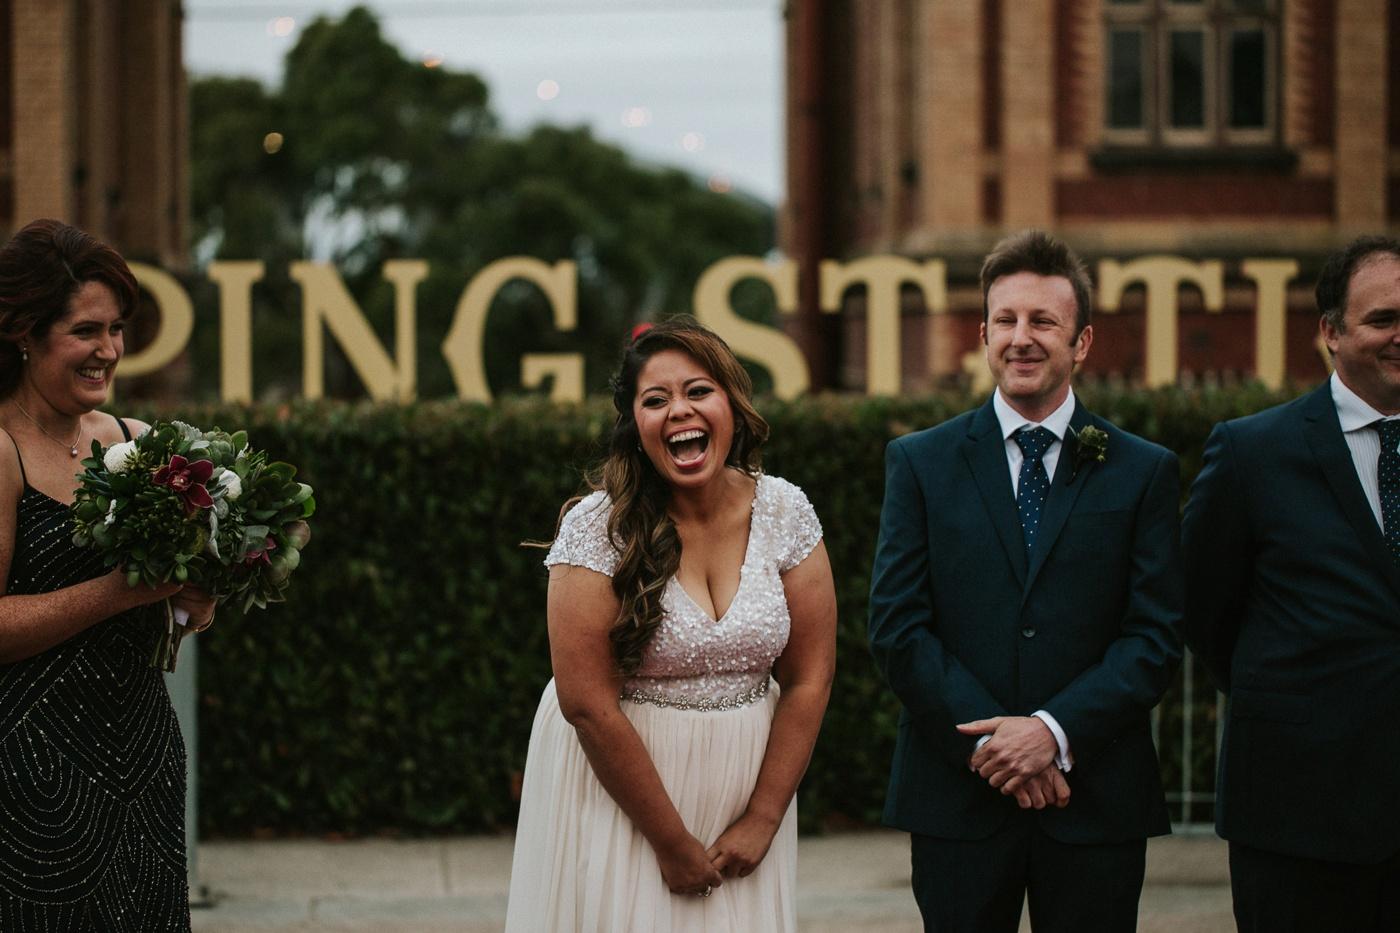 anitadaniel_melbourne-scienceworks-relaxed-fun-geek-wedding_melbourne-candid-wedding-photography_45